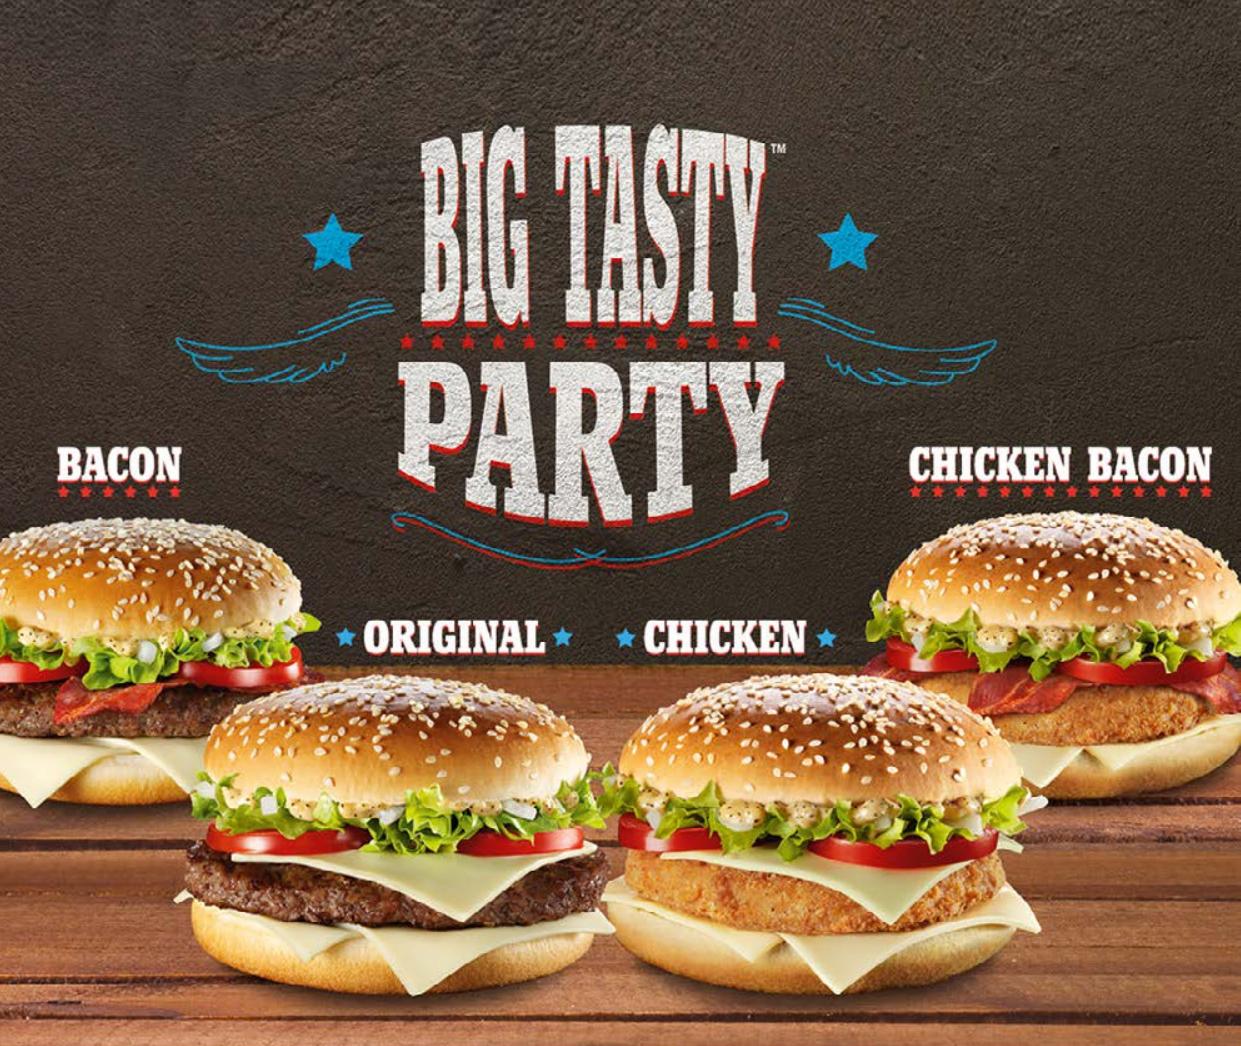 Tasty party